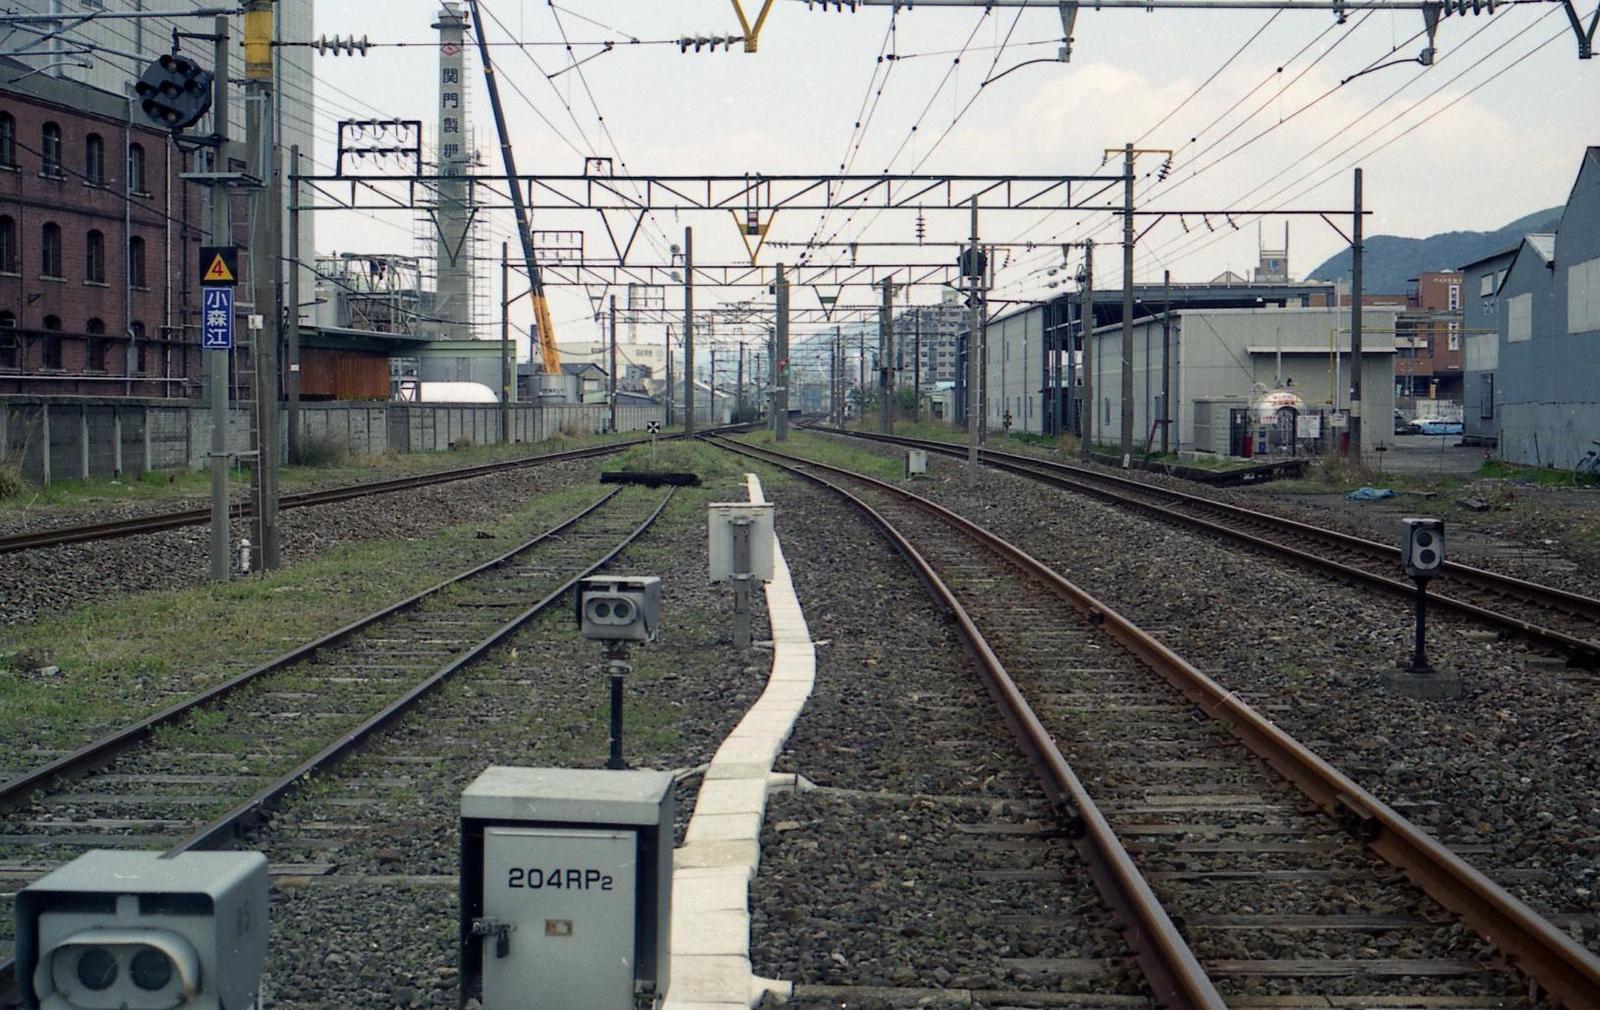 20010401c02